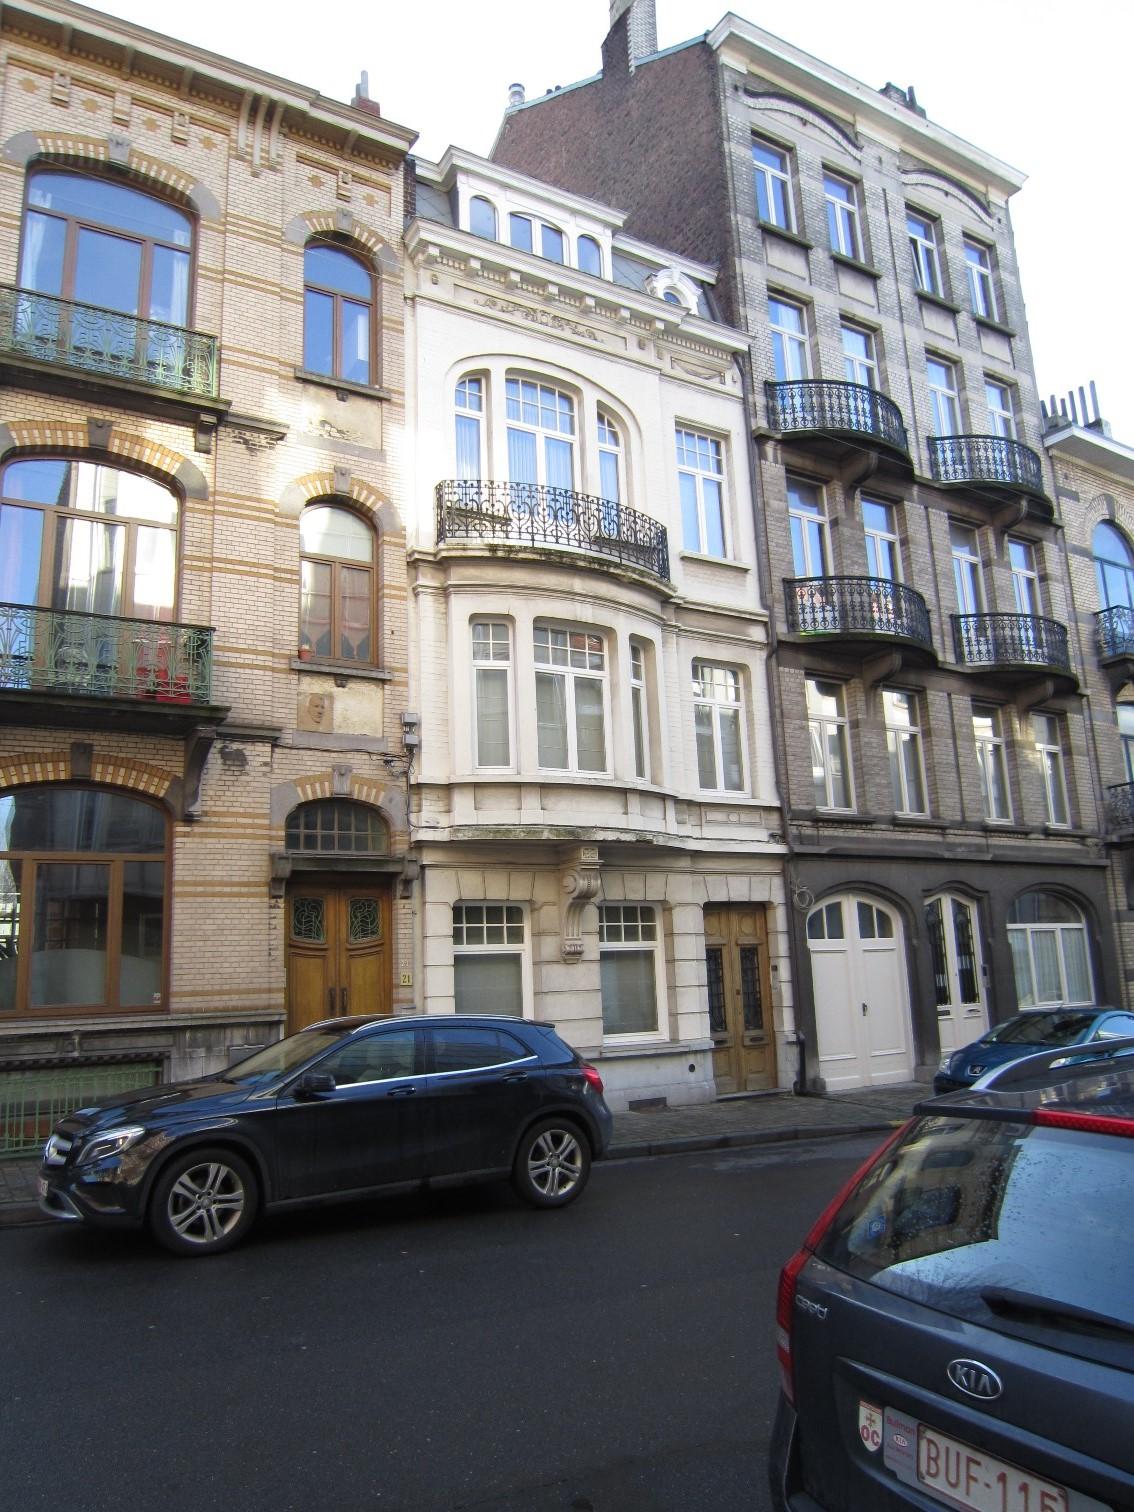 Rue Jan Blockx 19, 2015